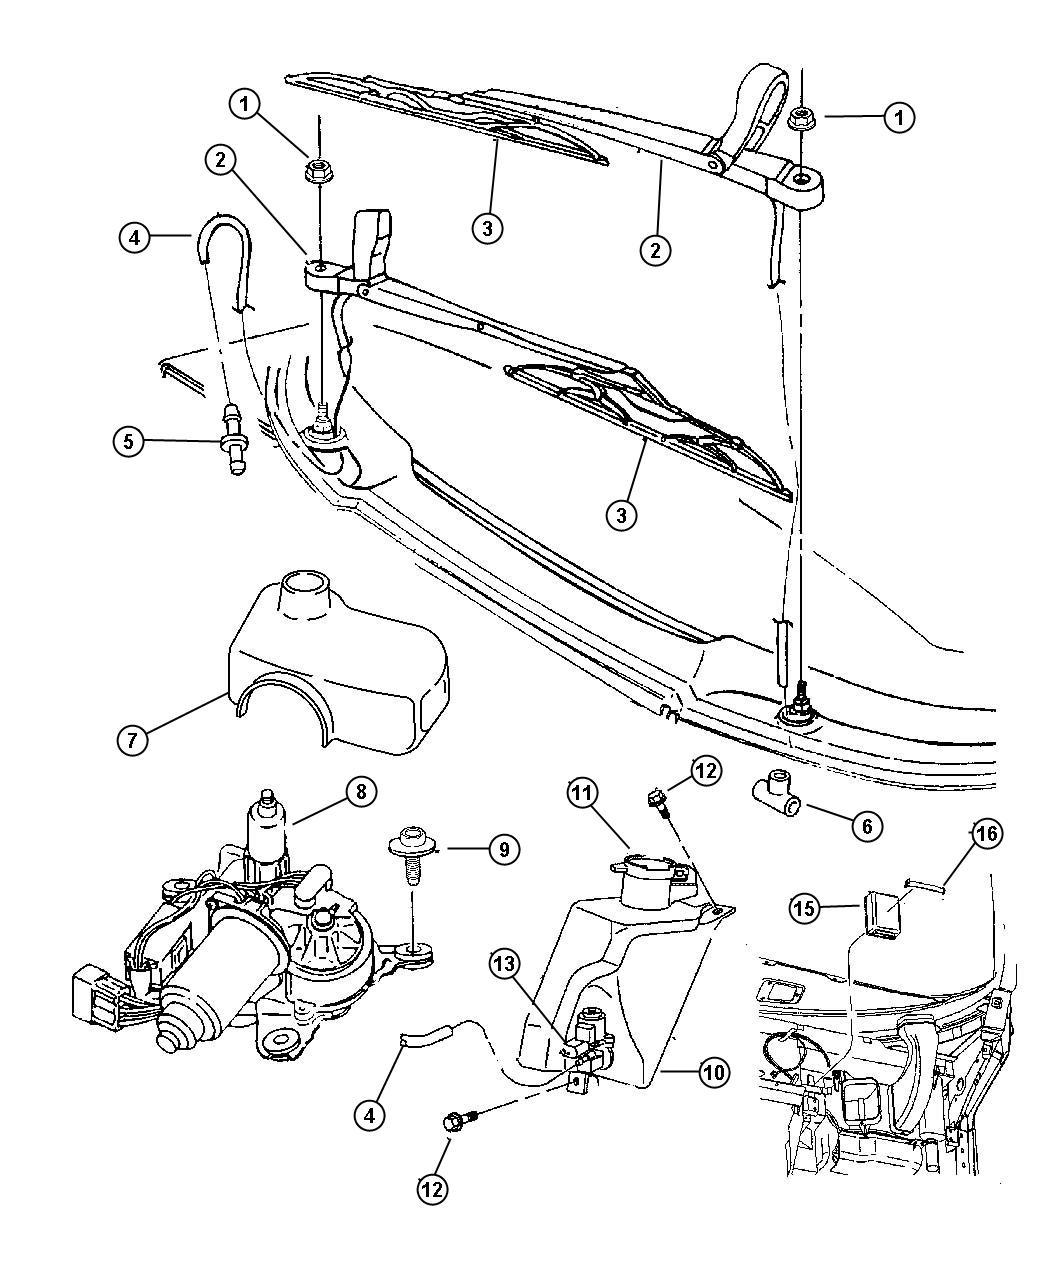 1995 Dodge Viper Motor. Windshield wiper, wiper. Right